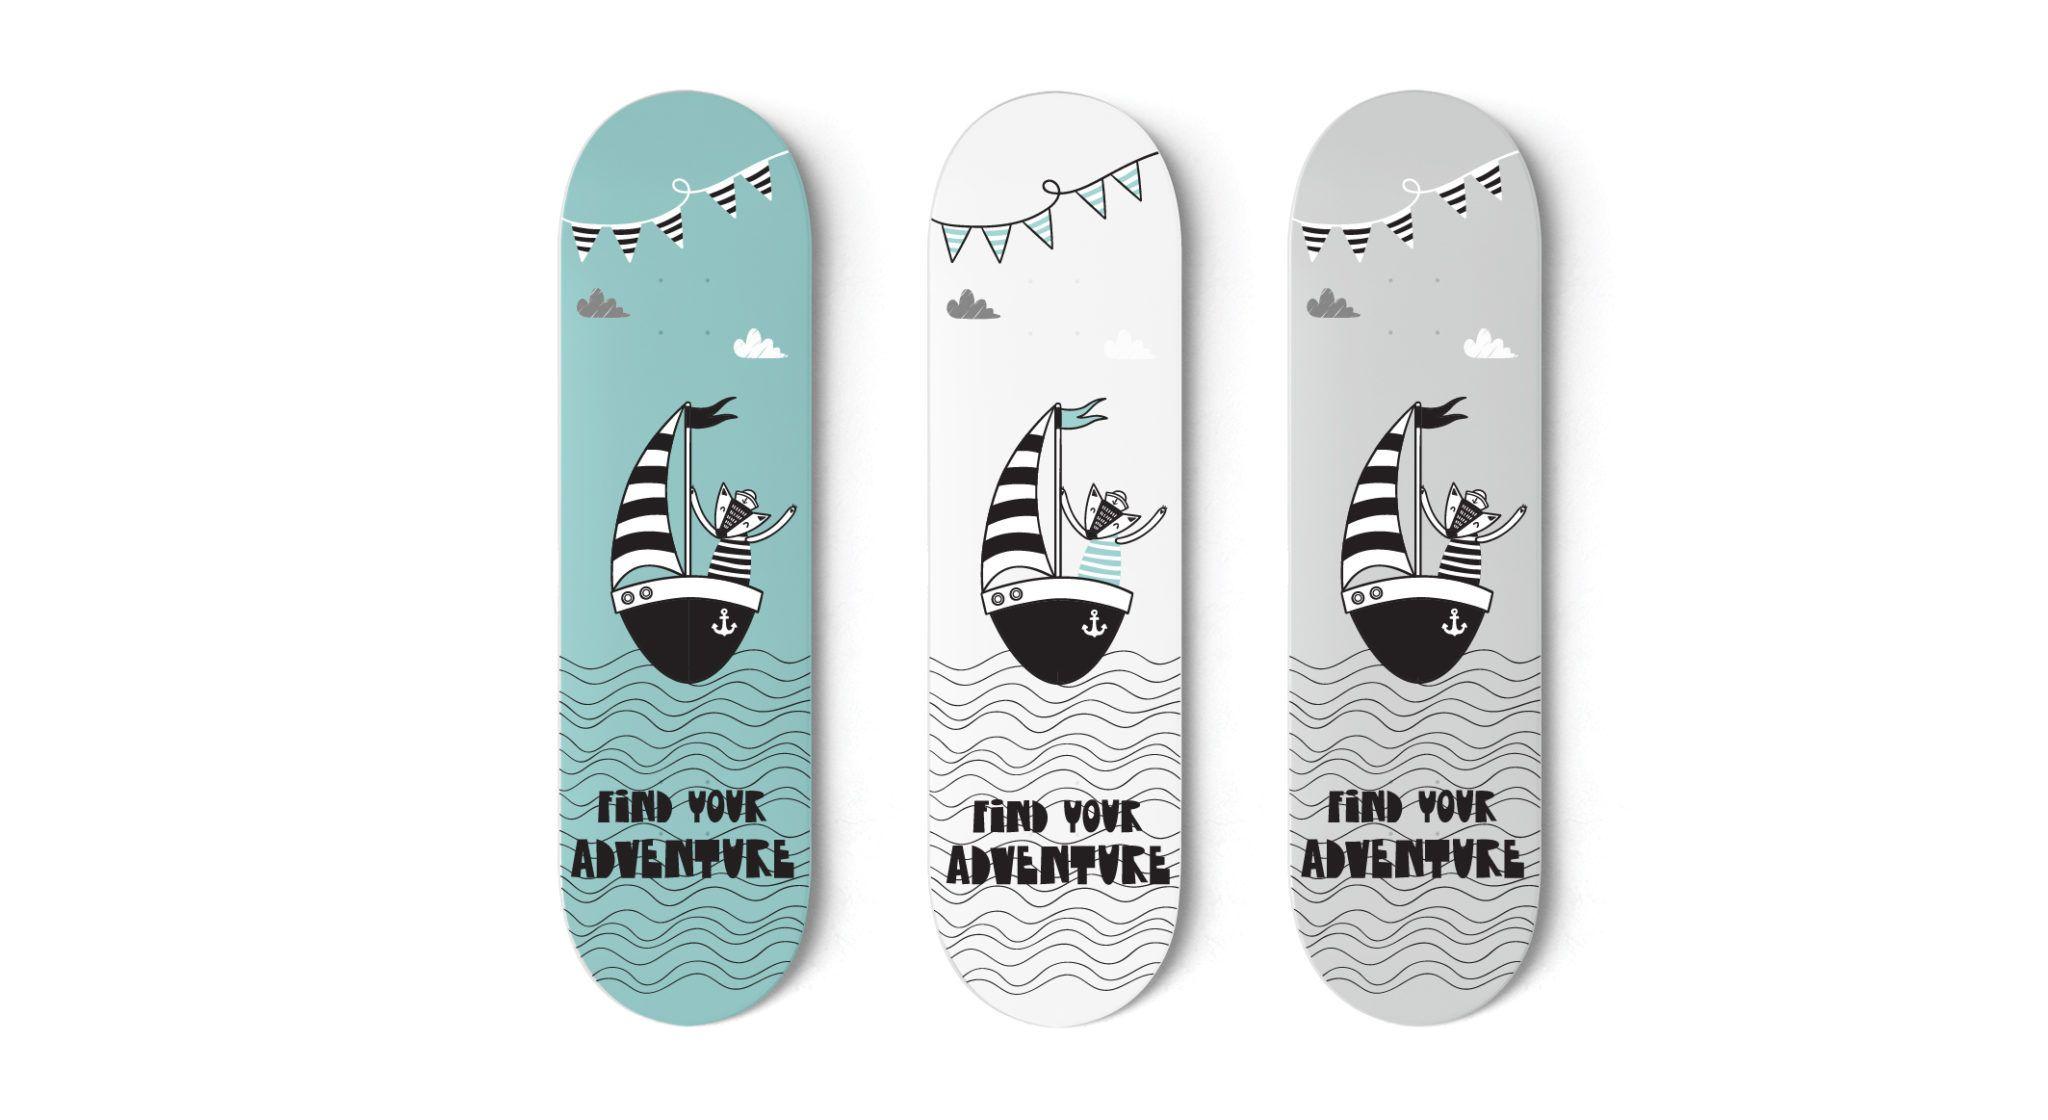 Find Your Adventure Skateboard Art In 2020 Skateboard Deck Art Skateboard Decks Skateboard